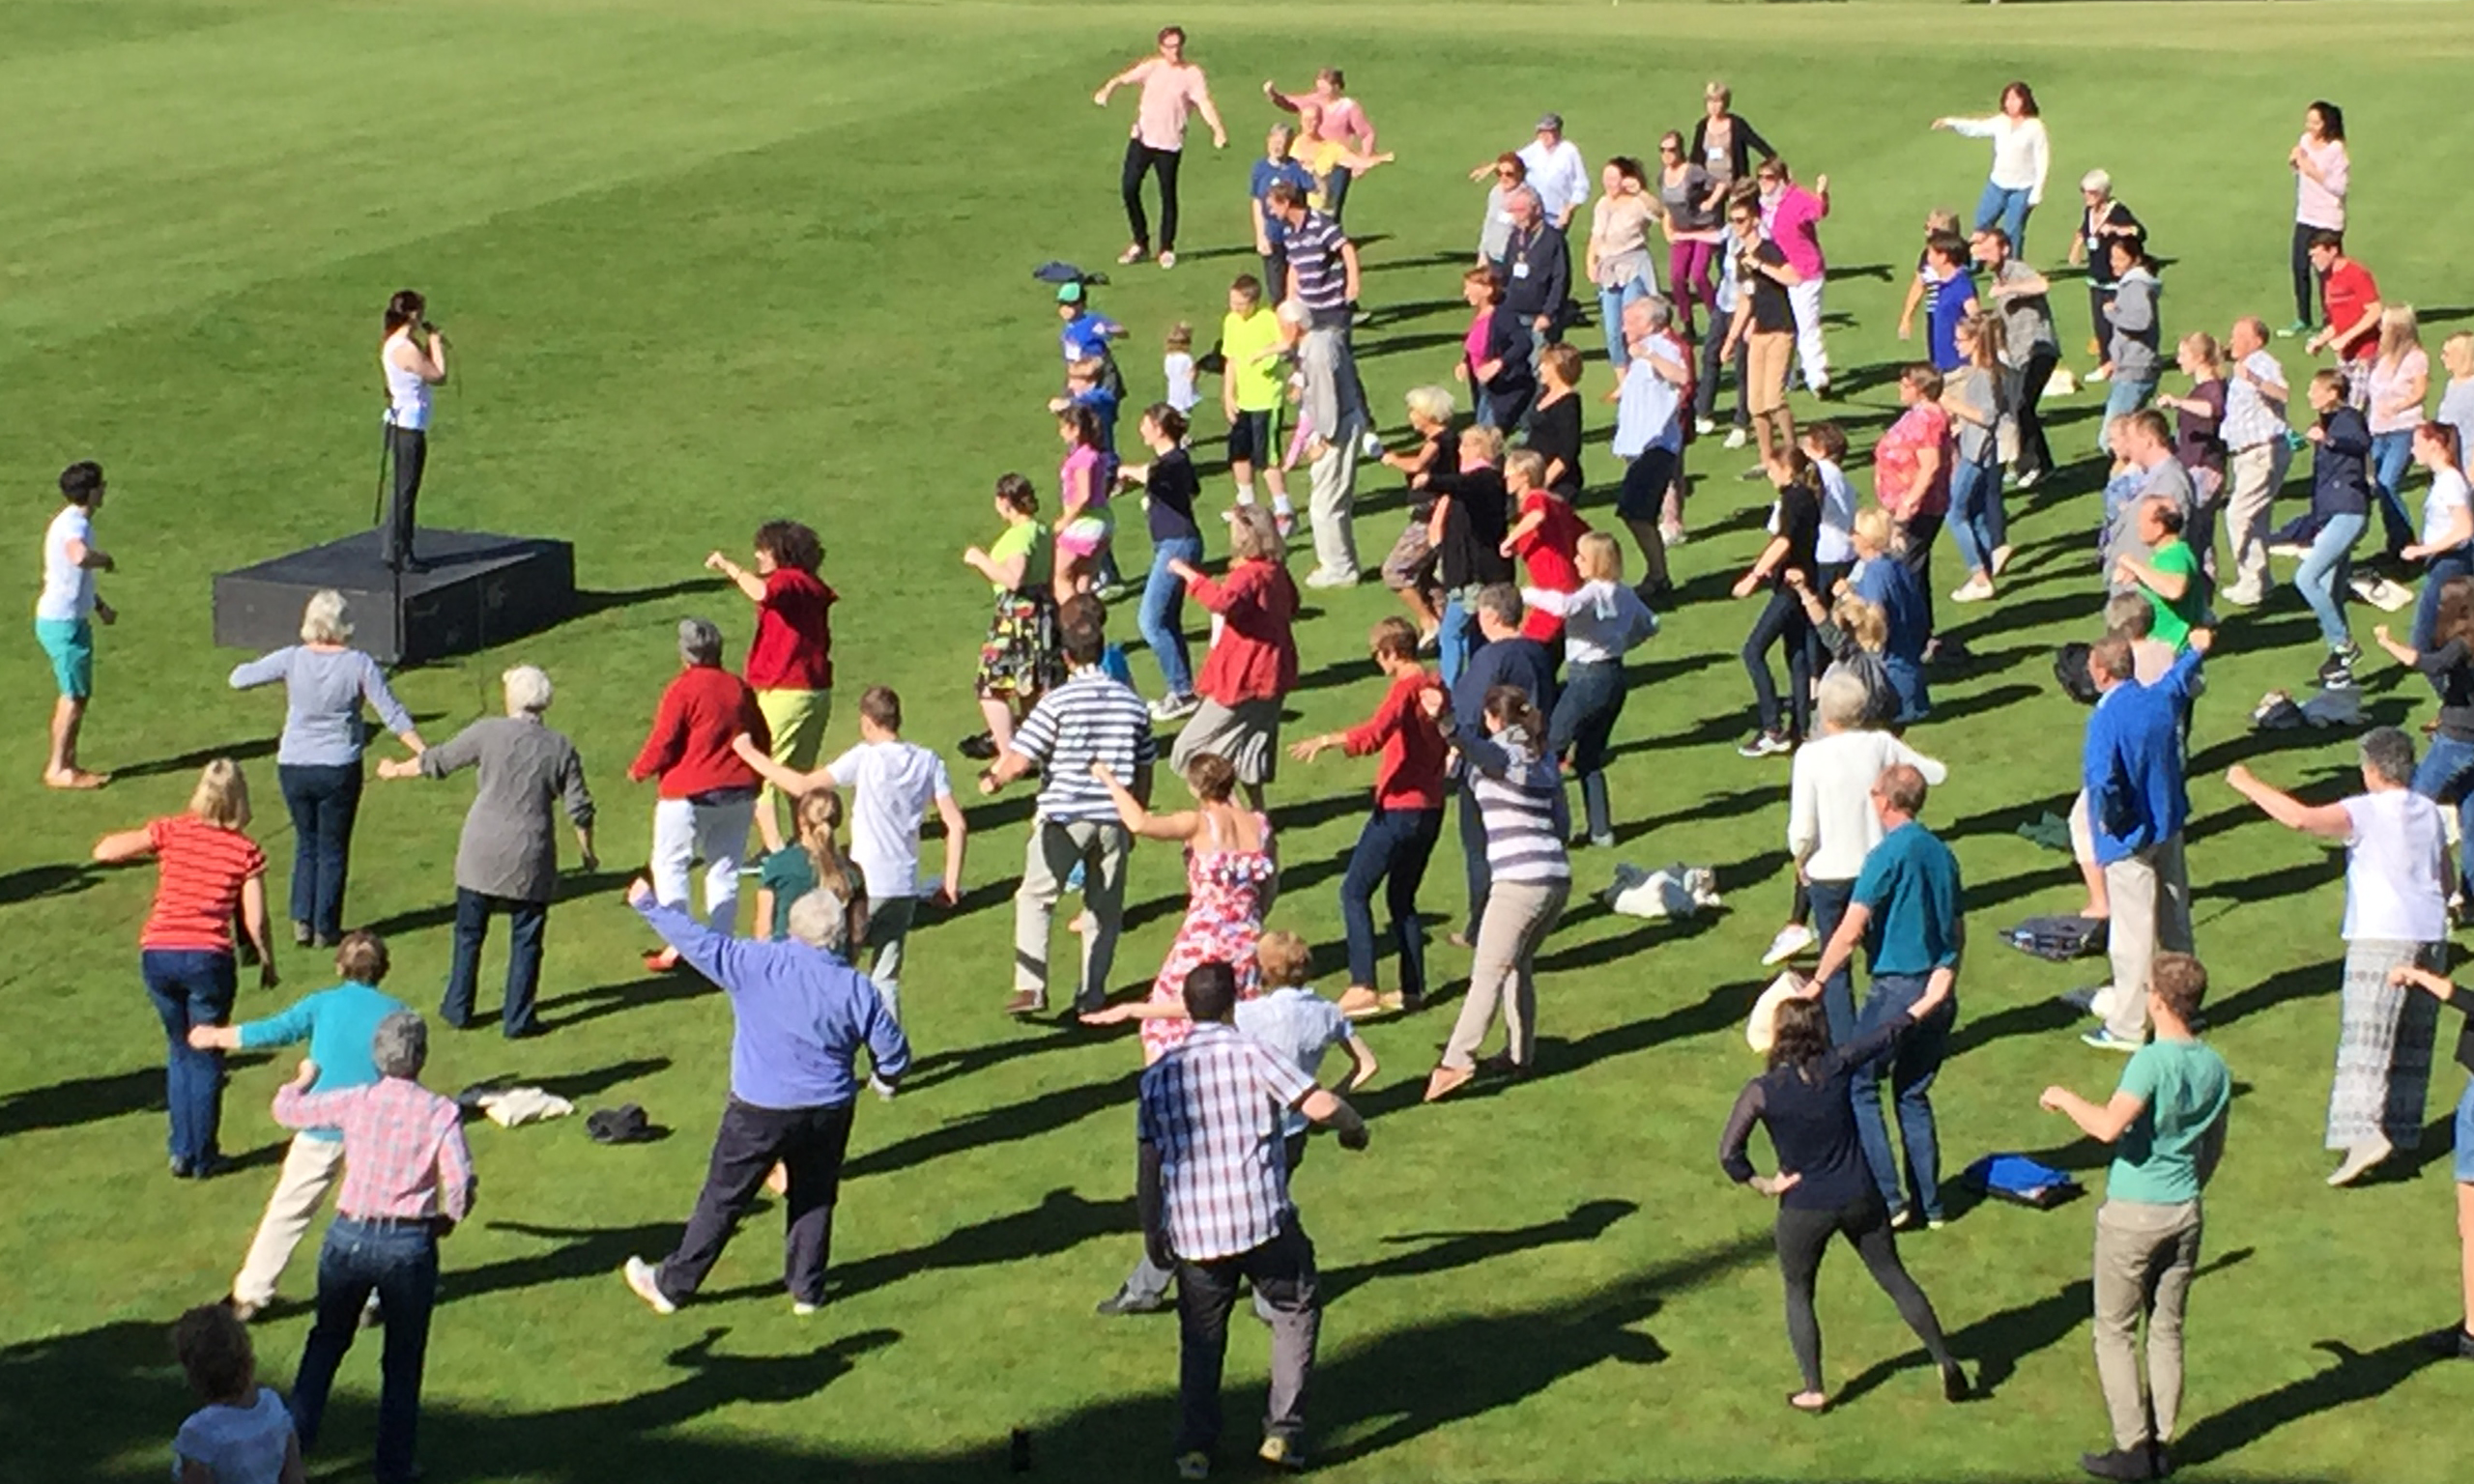 Get Movement class held outdoors